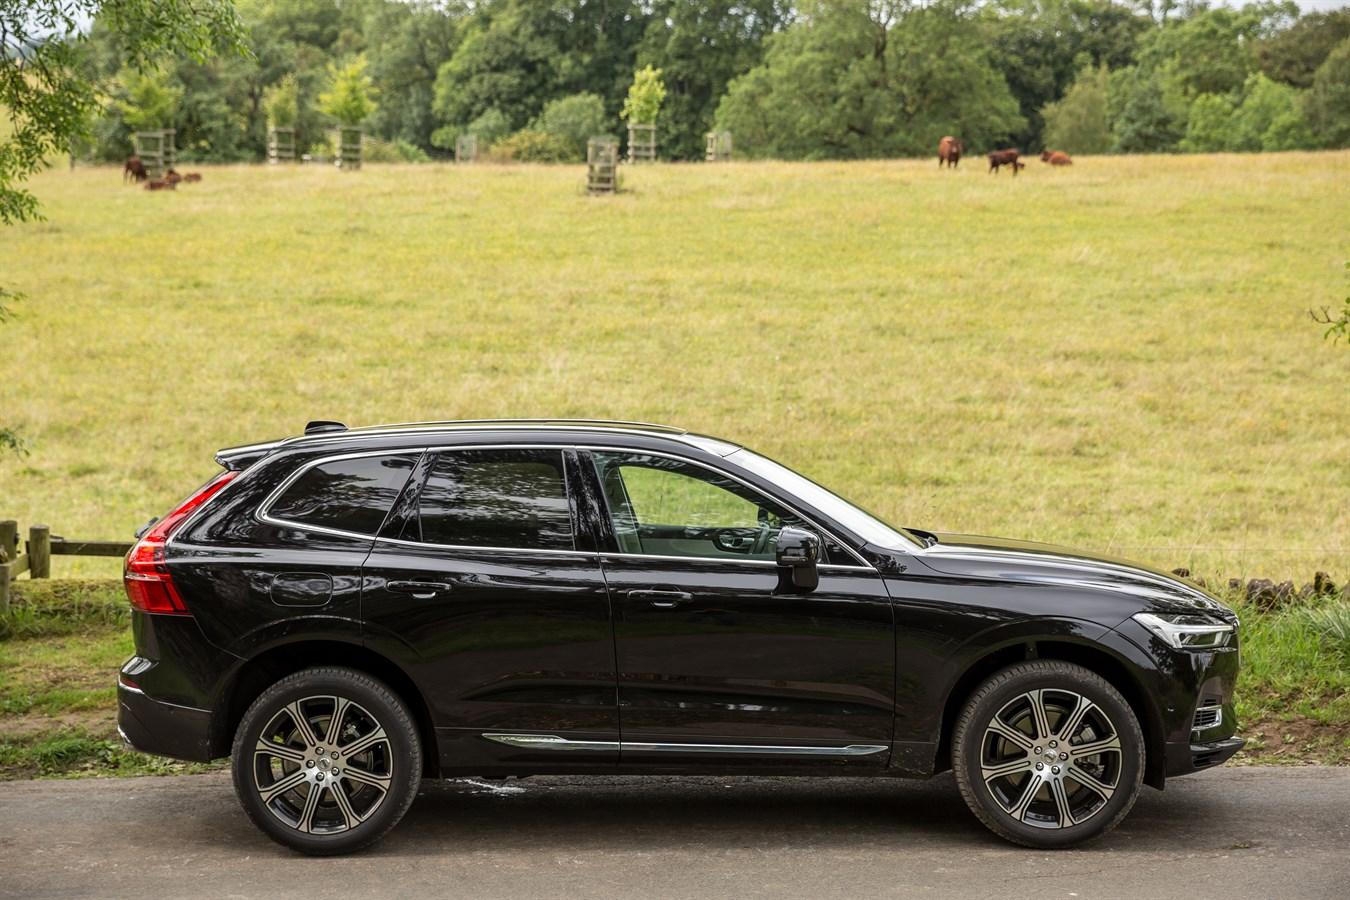 Volvo XC60 T8 Twin Engine - Volvo Car UK Media Newsroom